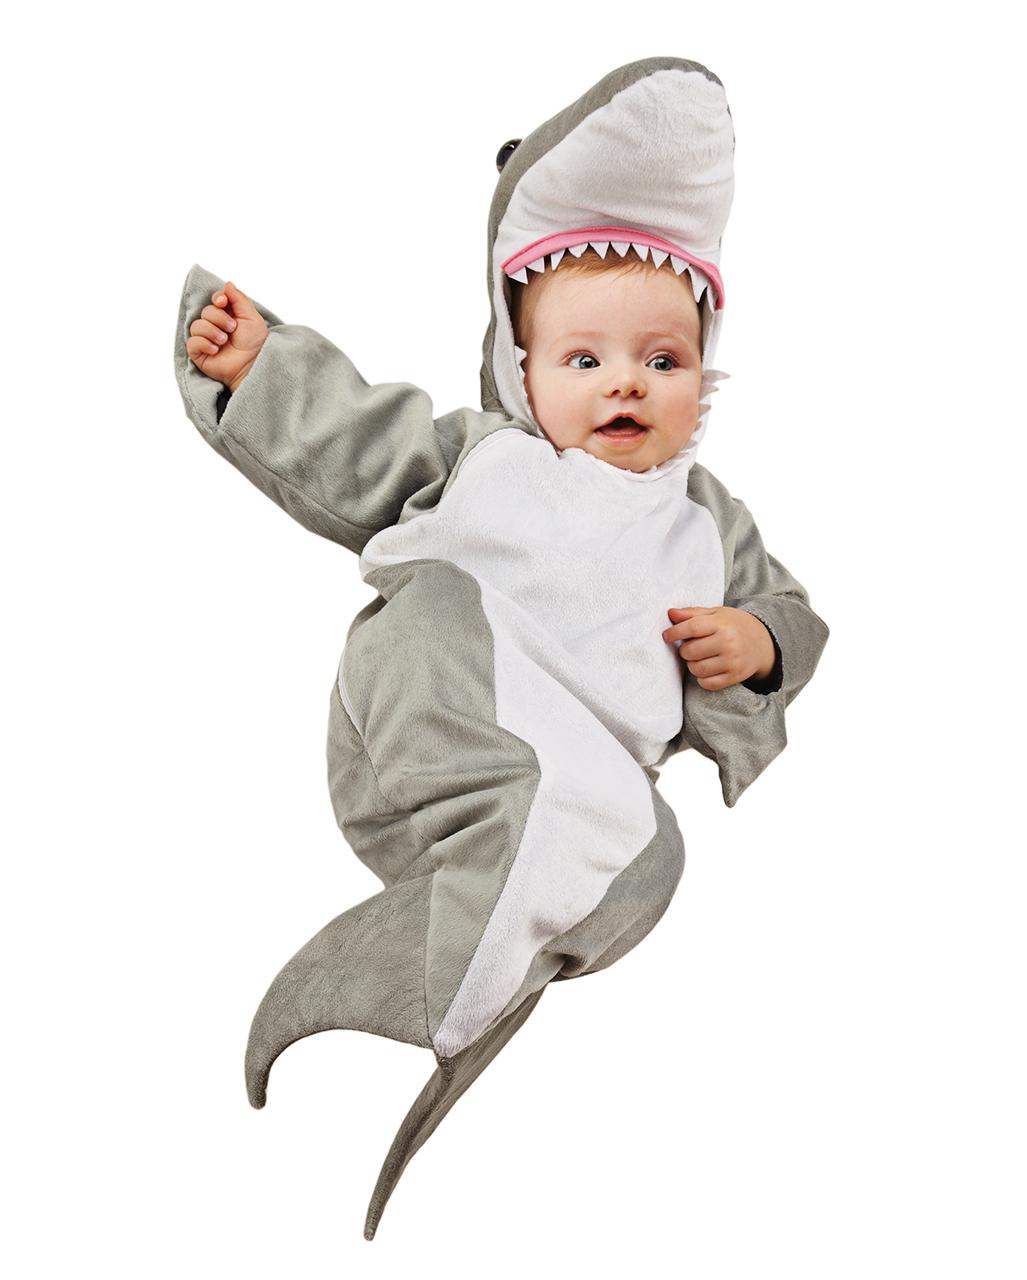 haifisch baby kost m f r karneval kaufen horror. Black Bedroom Furniture Sets. Home Design Ideas